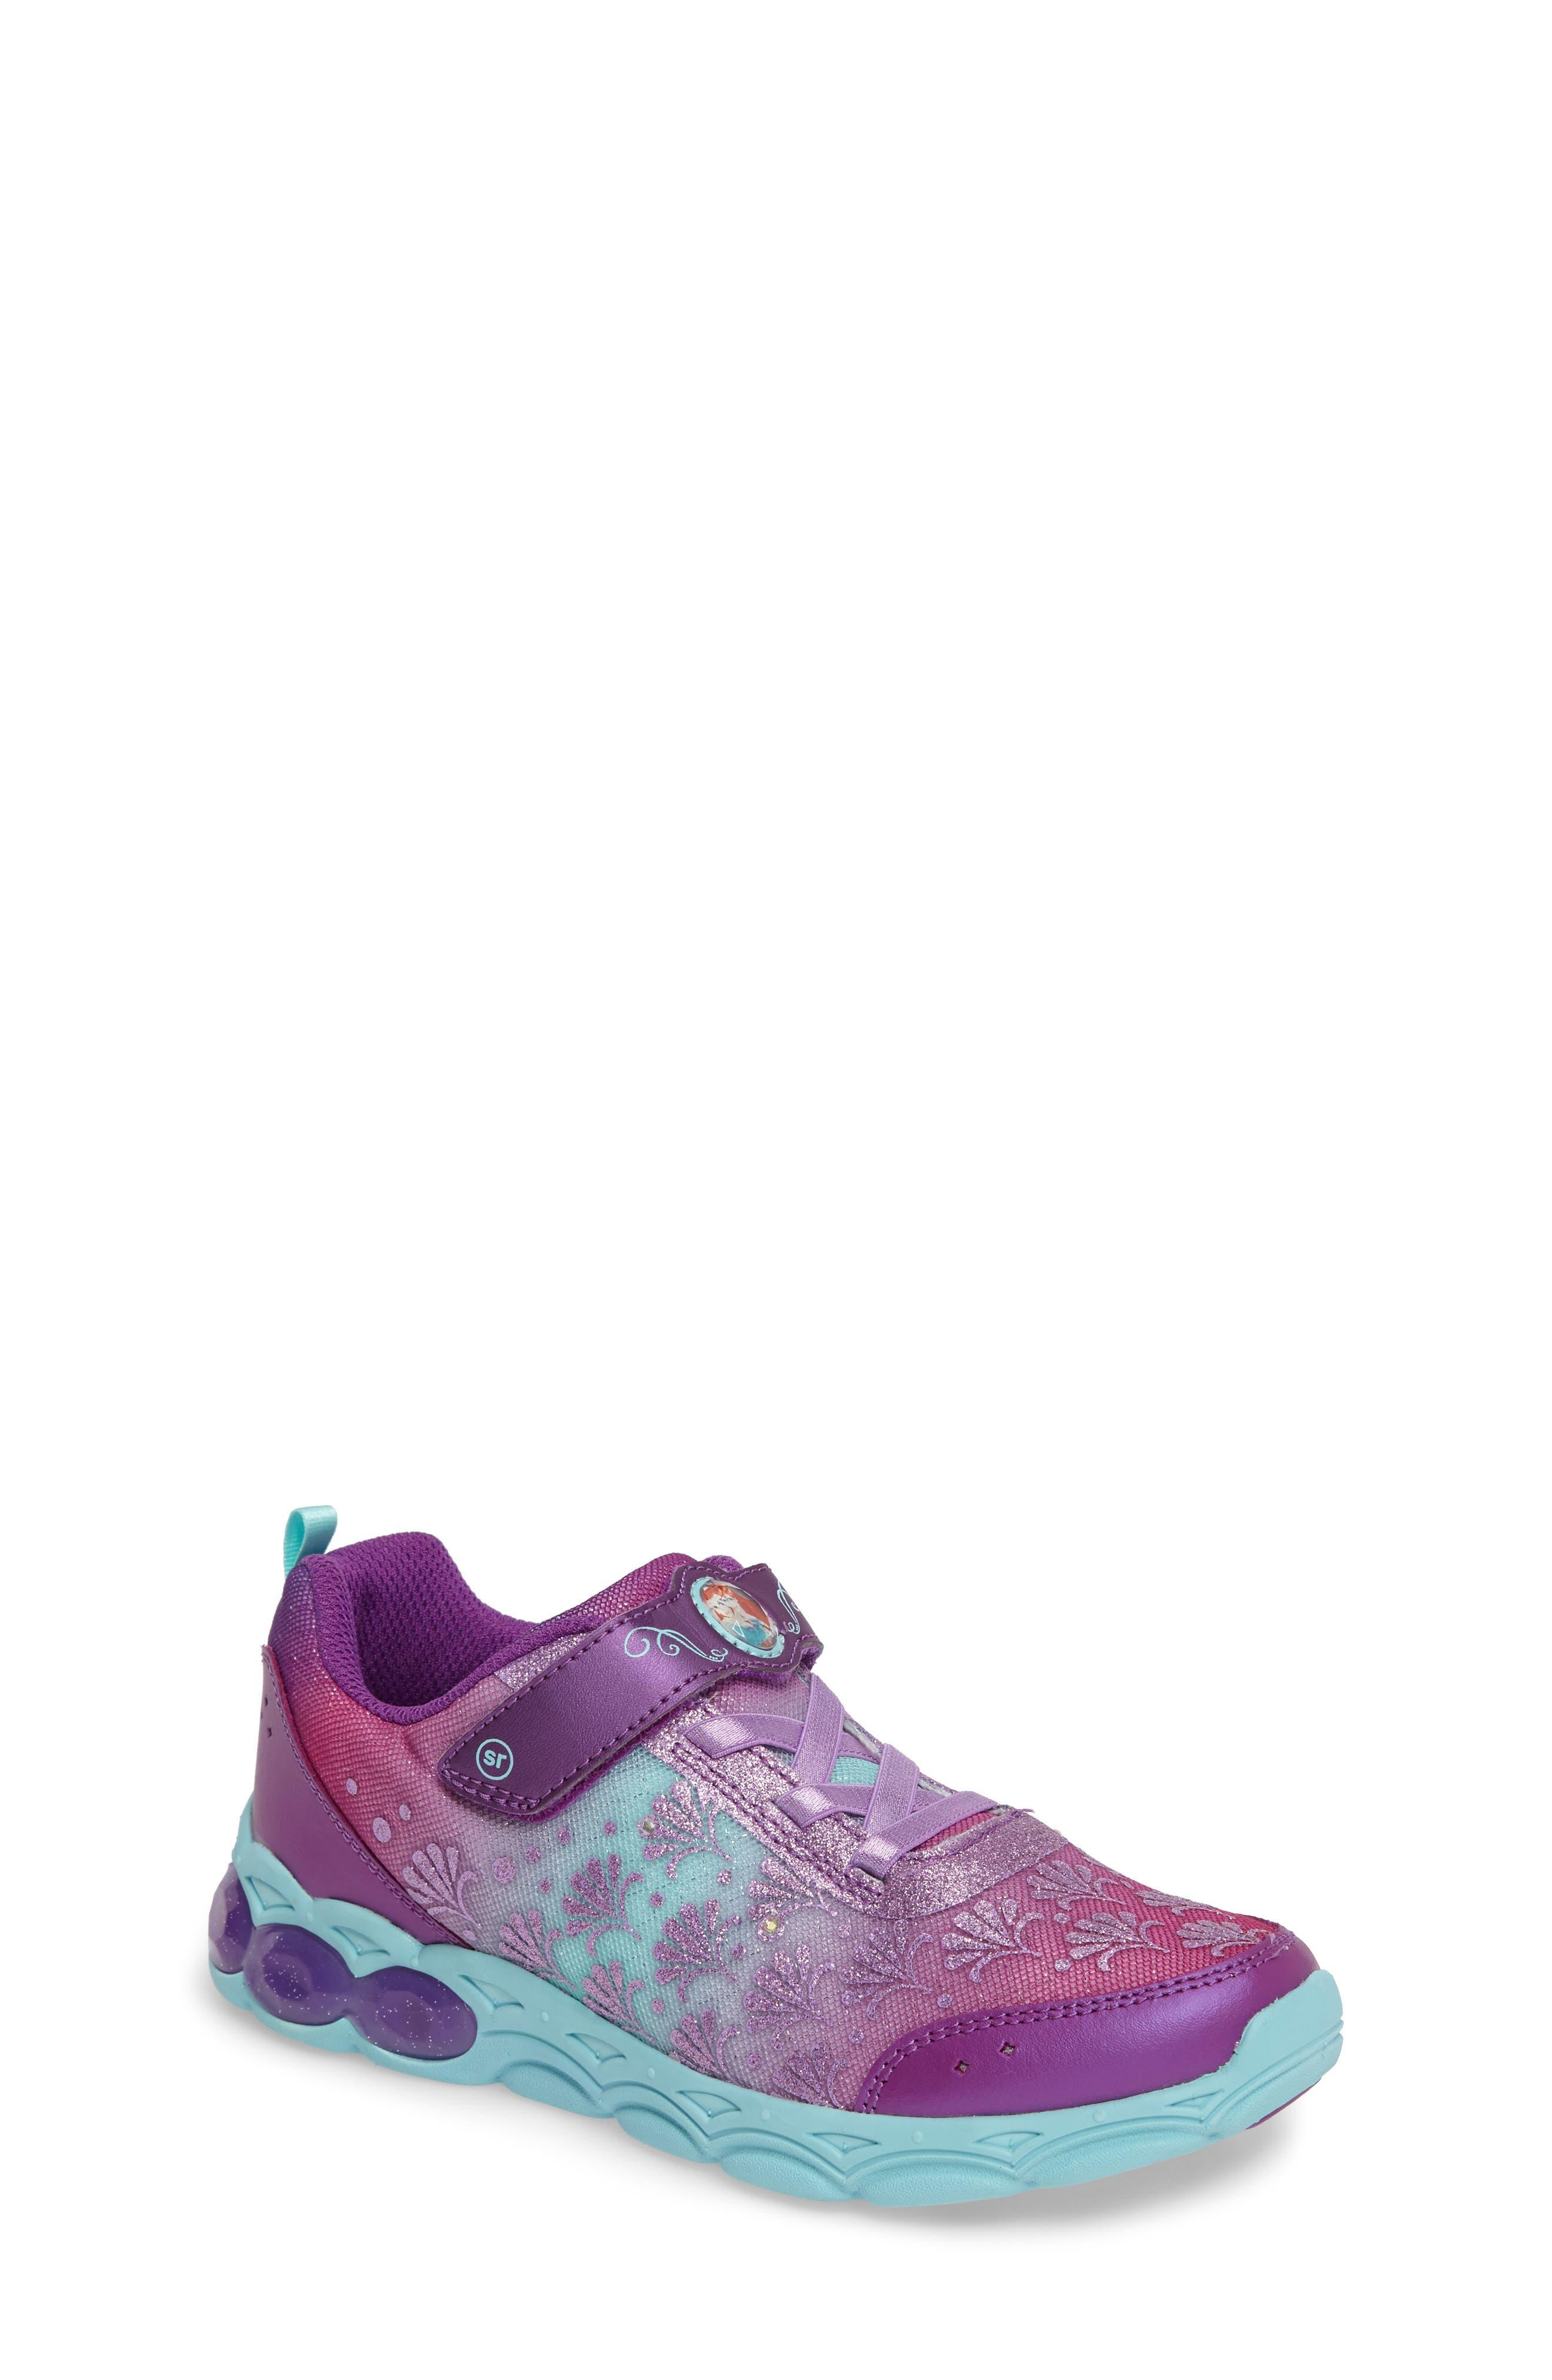 Disney<sup>®</sup> Ariel Ocean Adventurer Light-Up Sneaker,                             Main thumbnail 1, color,                             650